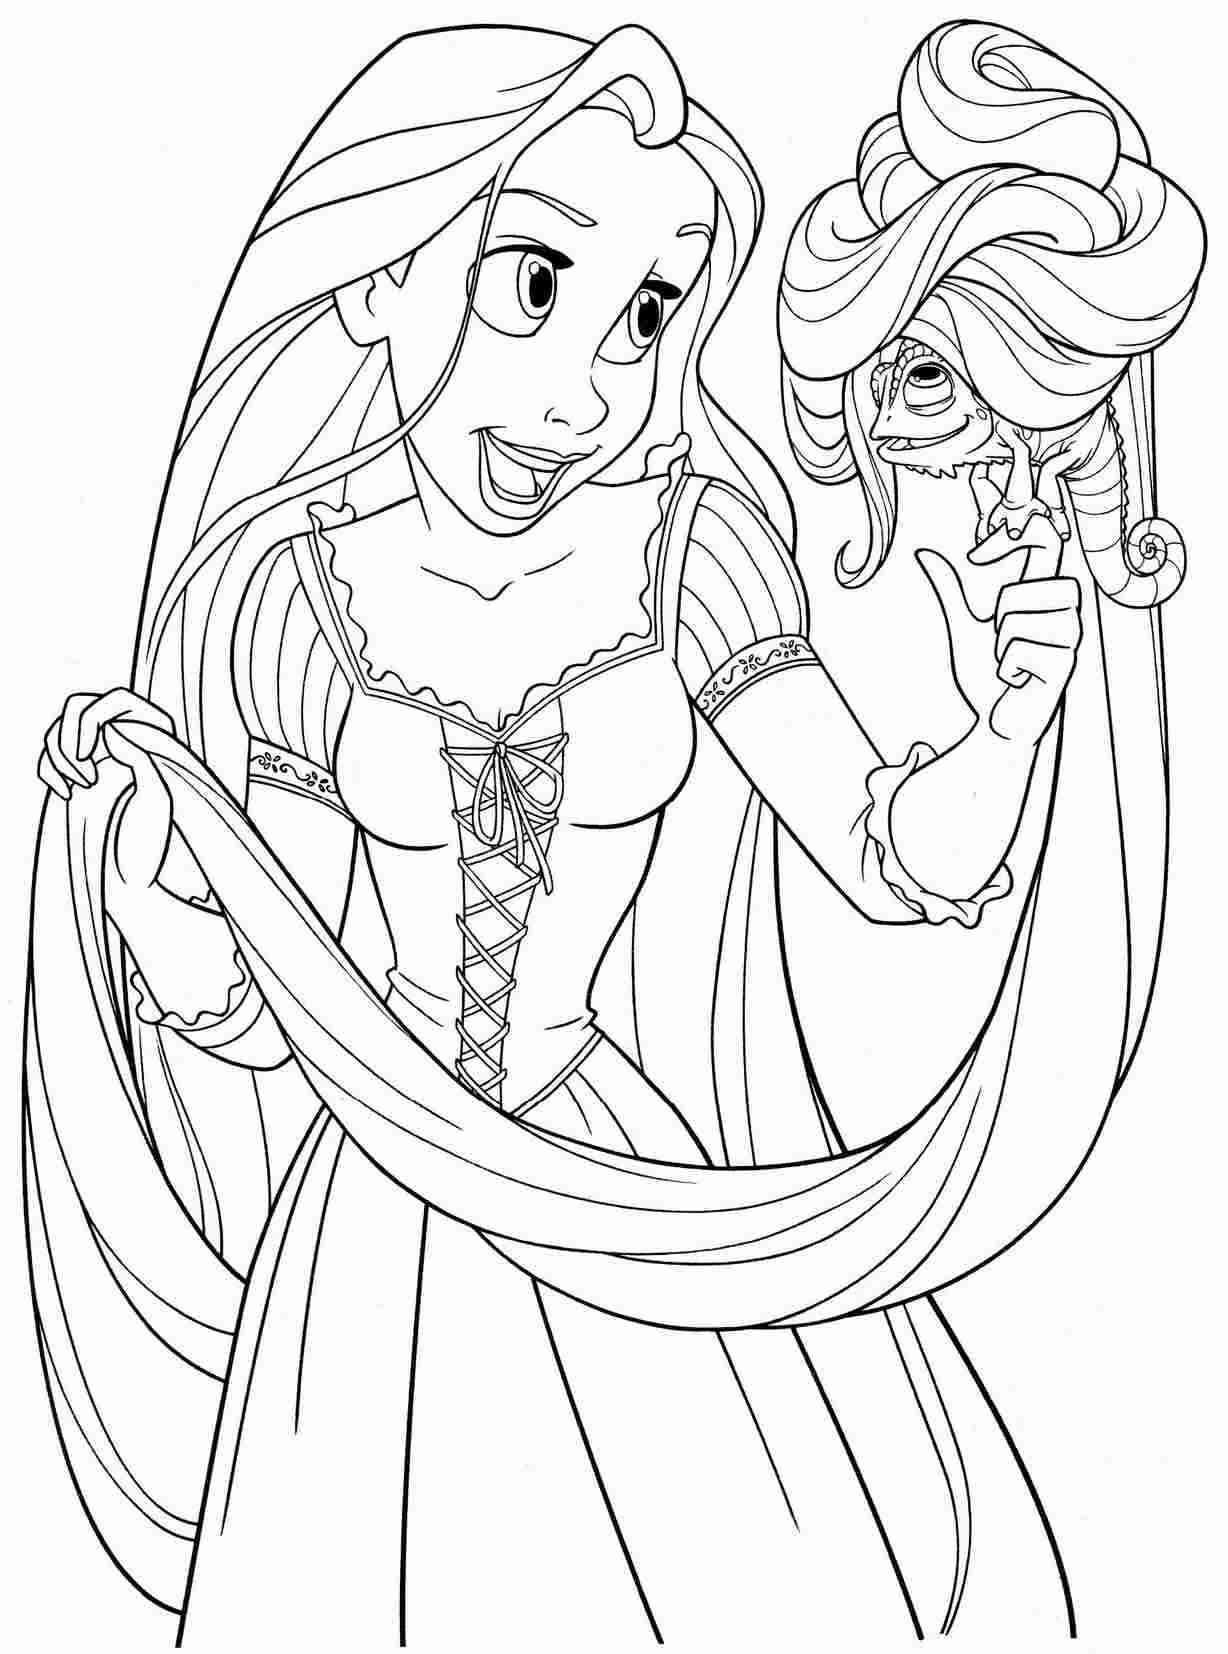 1228x1654 Printable Disney Princess Coloring Pages Rapunzel In Olegratiy